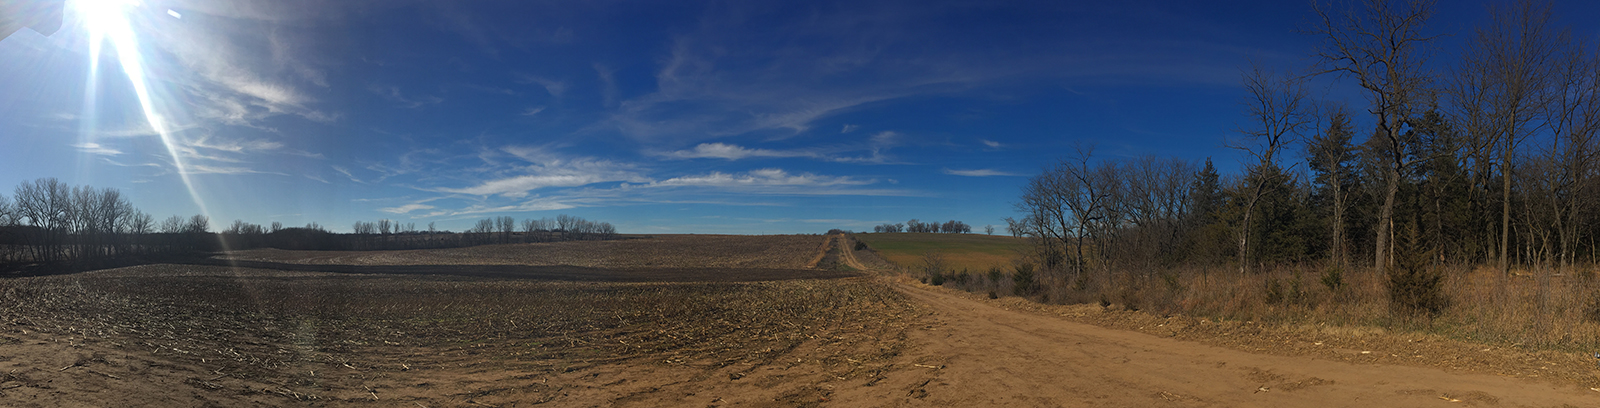 farm panoramic